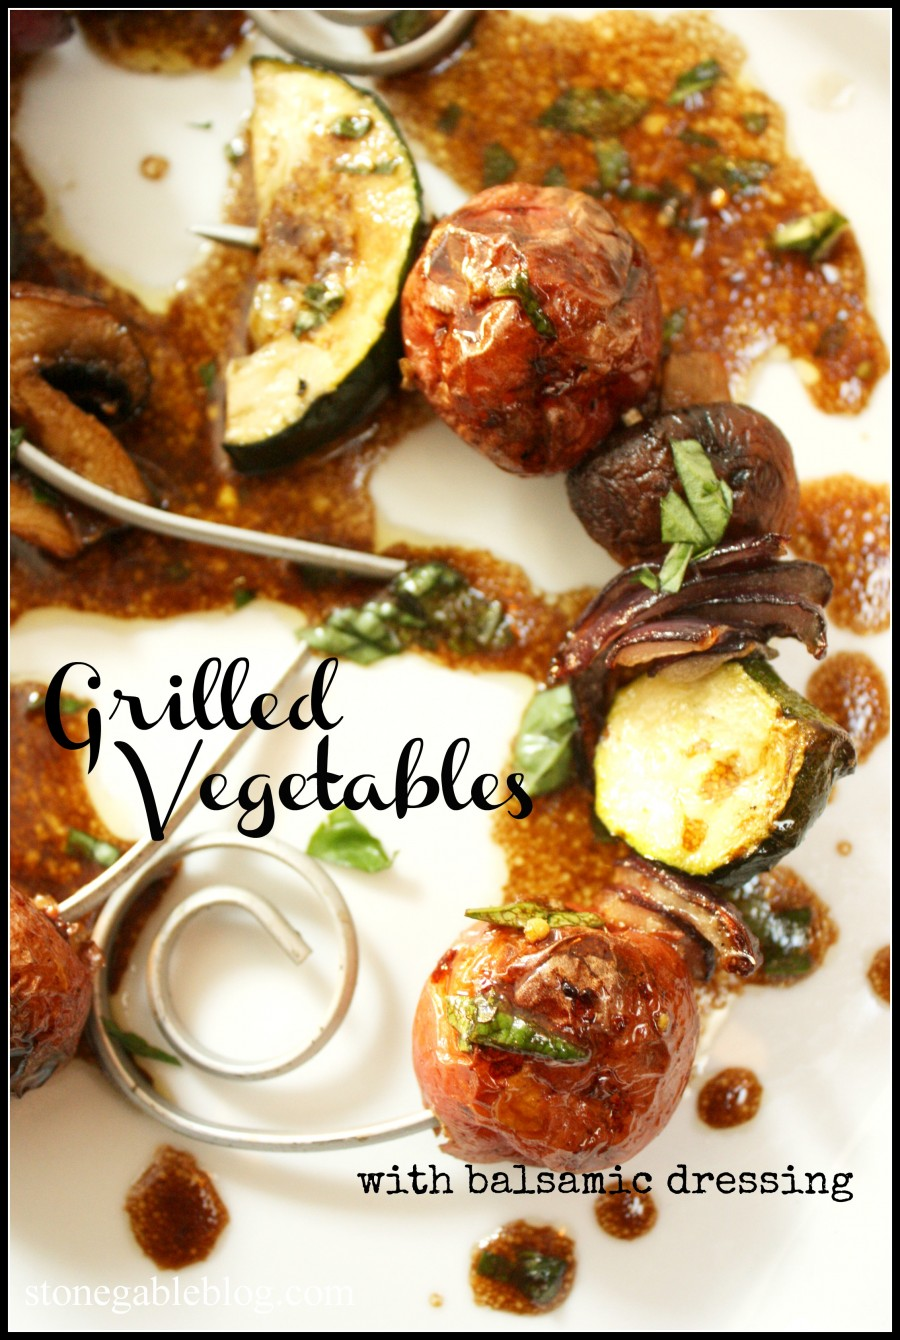 Grilled Vegetables With Balsamic Dressing stonegableblog.com Title Page